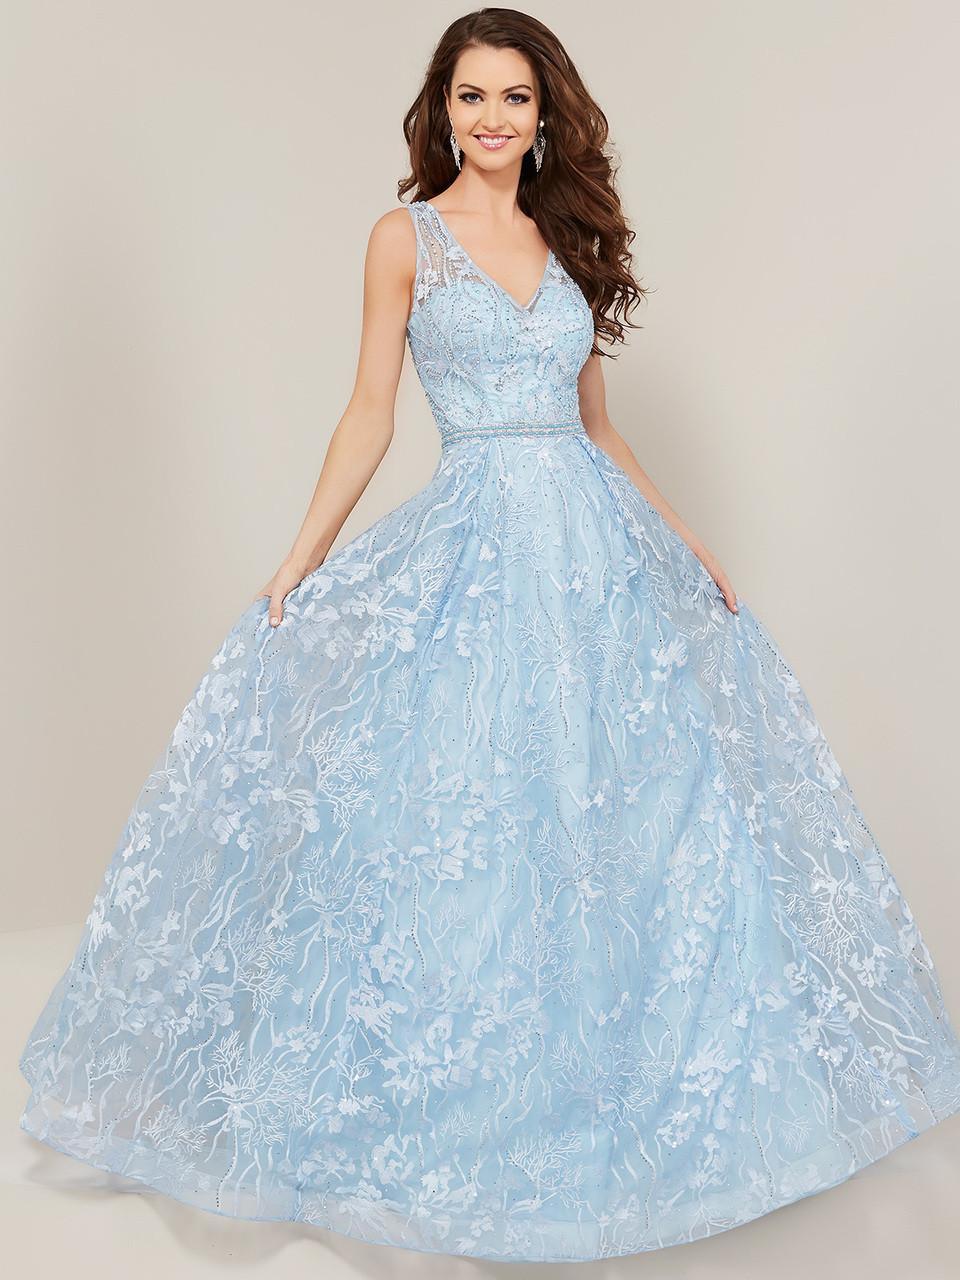 f2d4edb9a34 V-neck A-line Tiffany Designs 16346 Prom Dress - PromHeadquarters.com